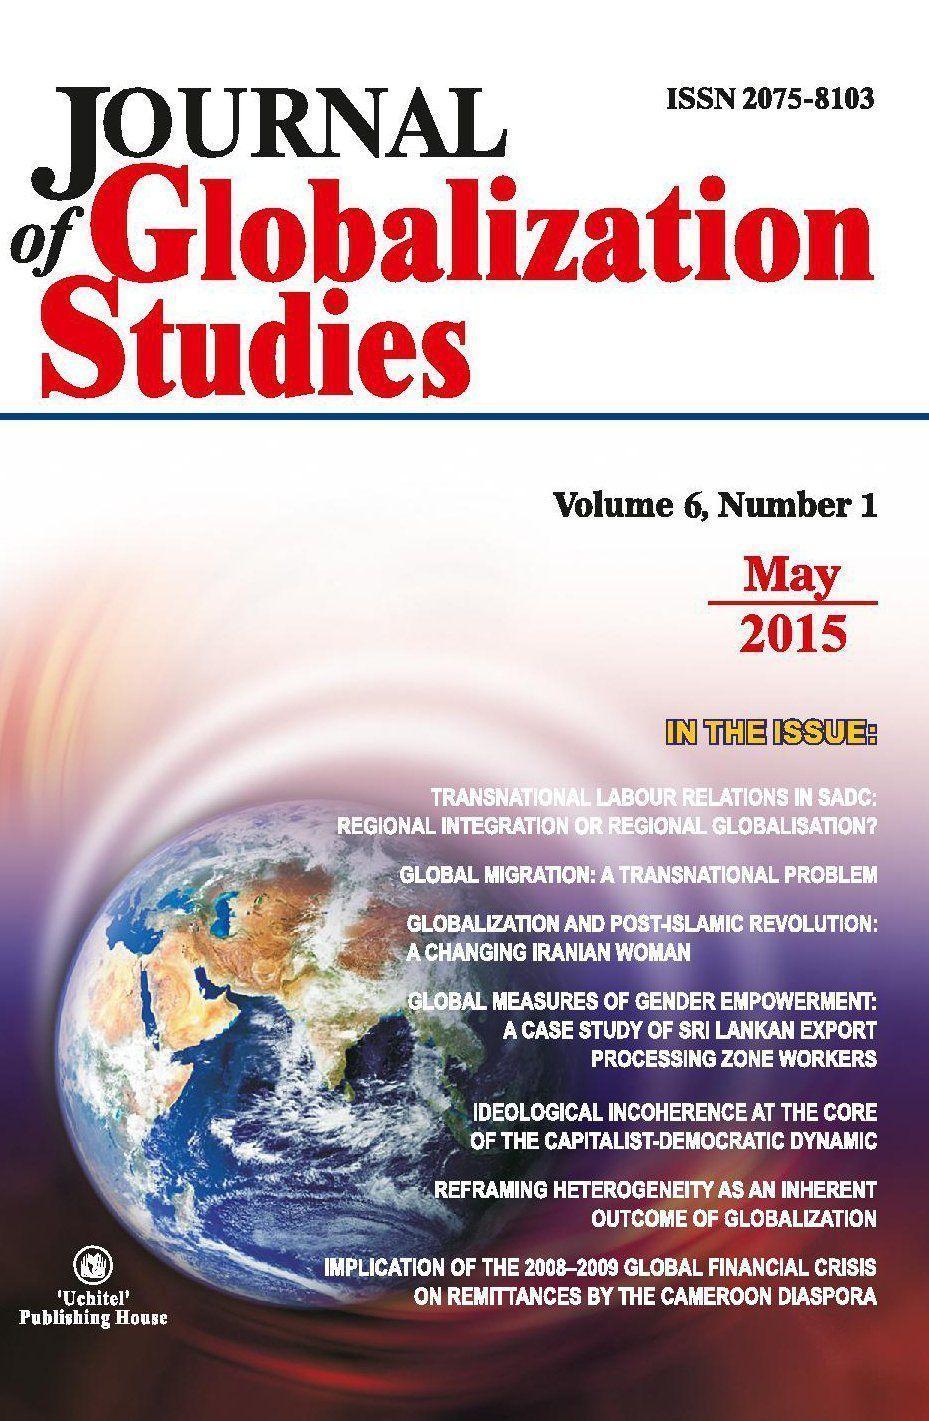 Journal of Globalization Studies Volume 6, Number 1, 2015 г. Журнал глобализационных исследований Международный журнал на английском языке